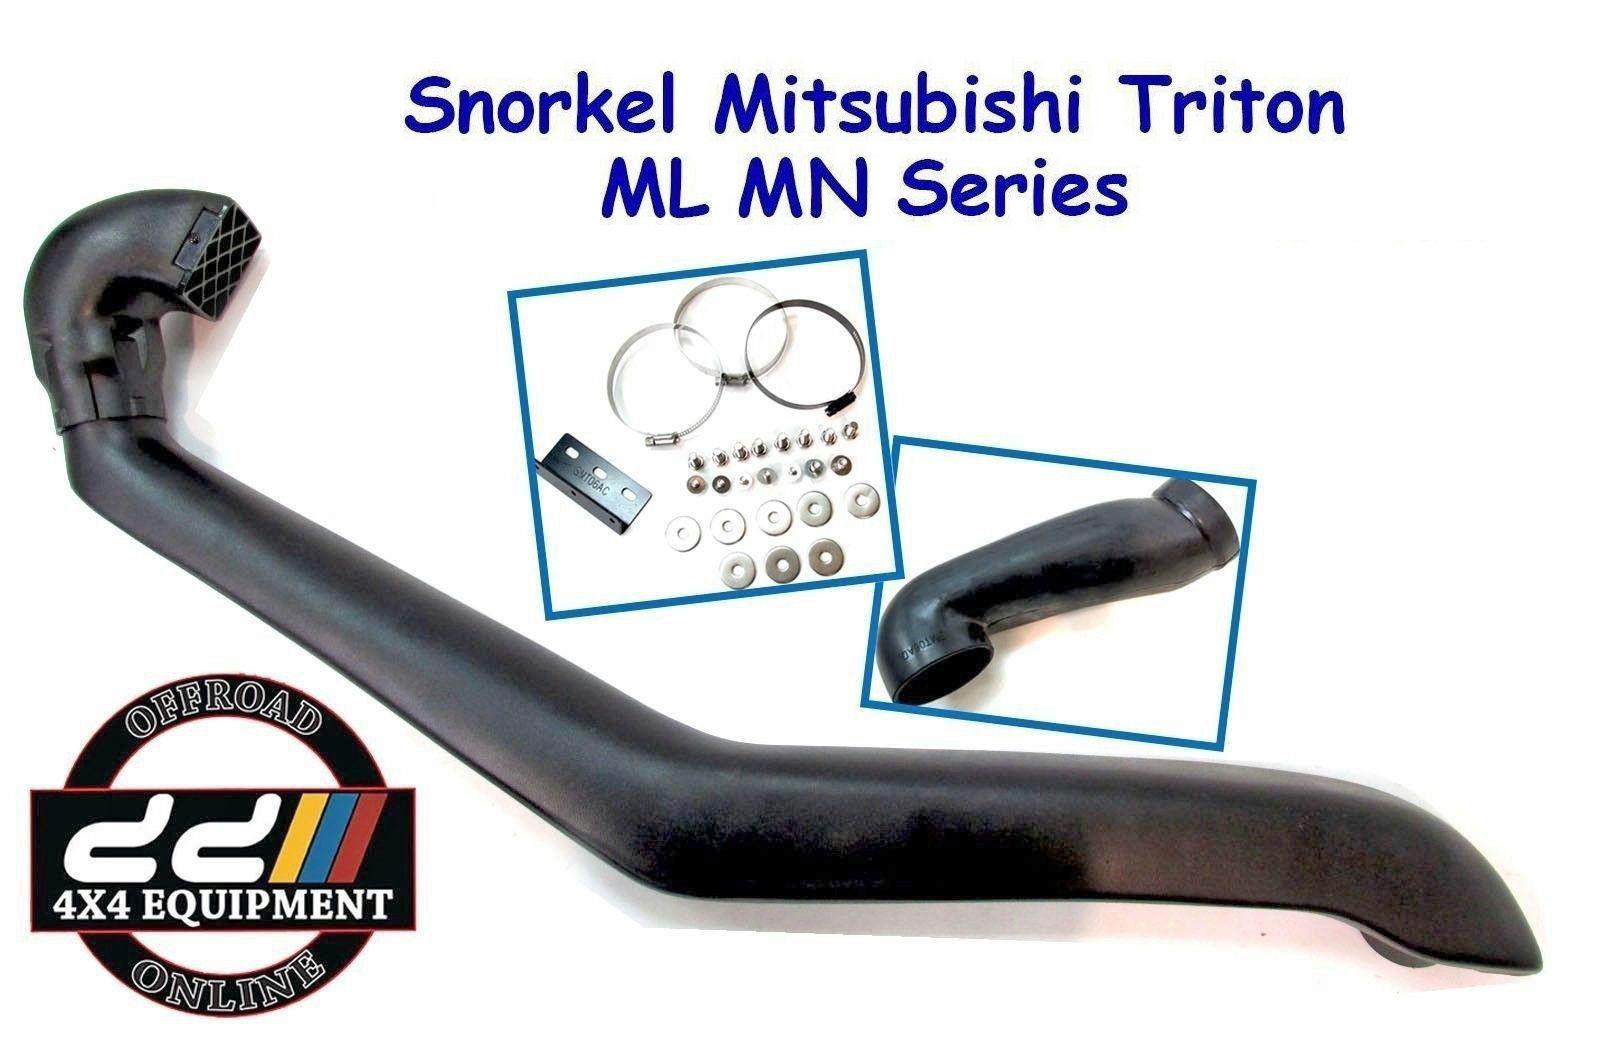 USエア インテーク シュノーケル 三菱トリトンL200 ML MN 05-14ディーゼルSMT06Aに適合するエアインテークシュノーケルキット Air Intake Snorkel Kit Fits Mitsubishi Triton L200 ML MN 05-14 Diesel SMT06A